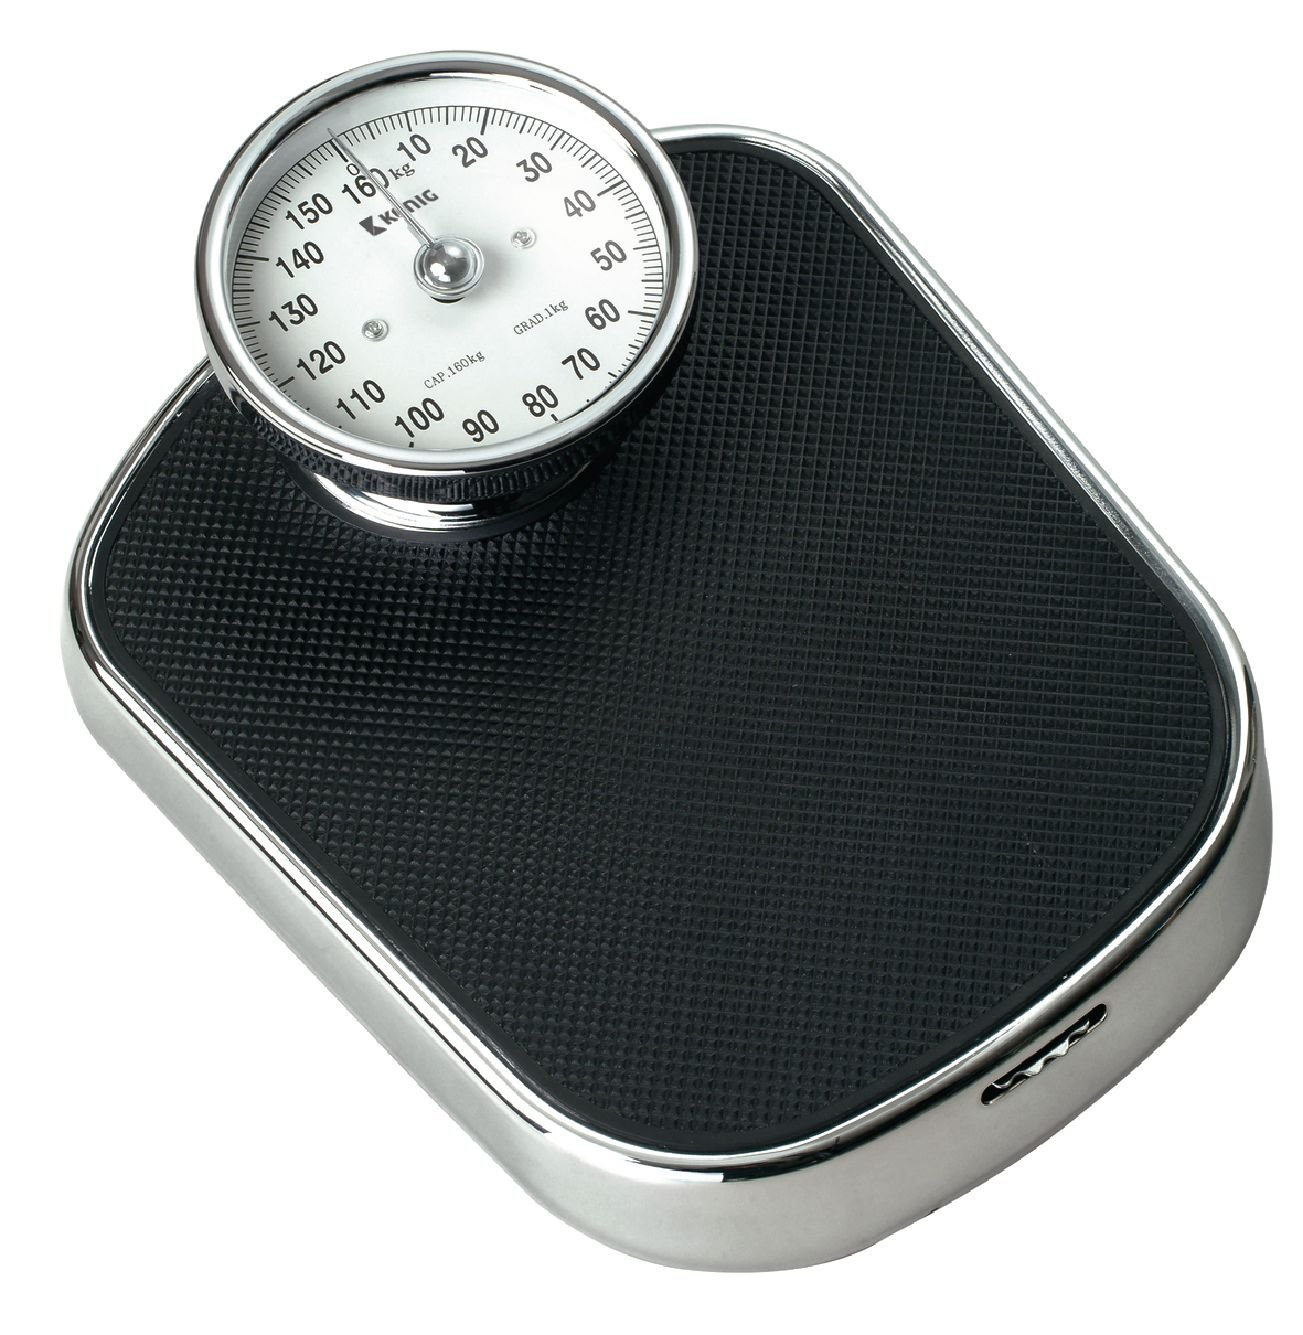 Konig Personal Scales Retro Nedis HC-PS700N